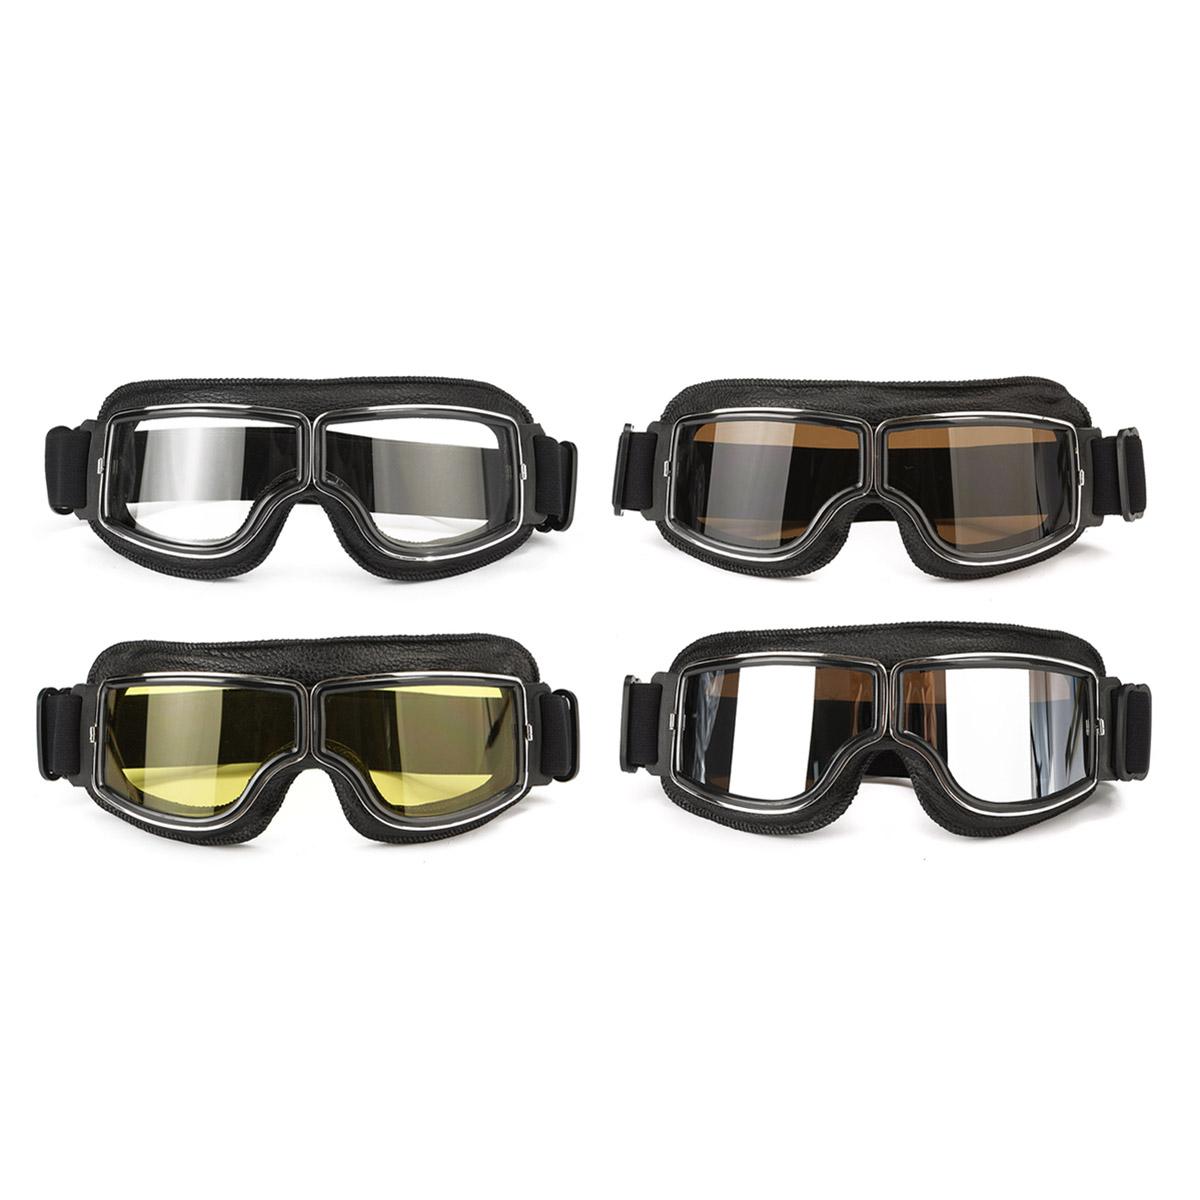 helmet leather goggles anti uv protective glasses eyewear